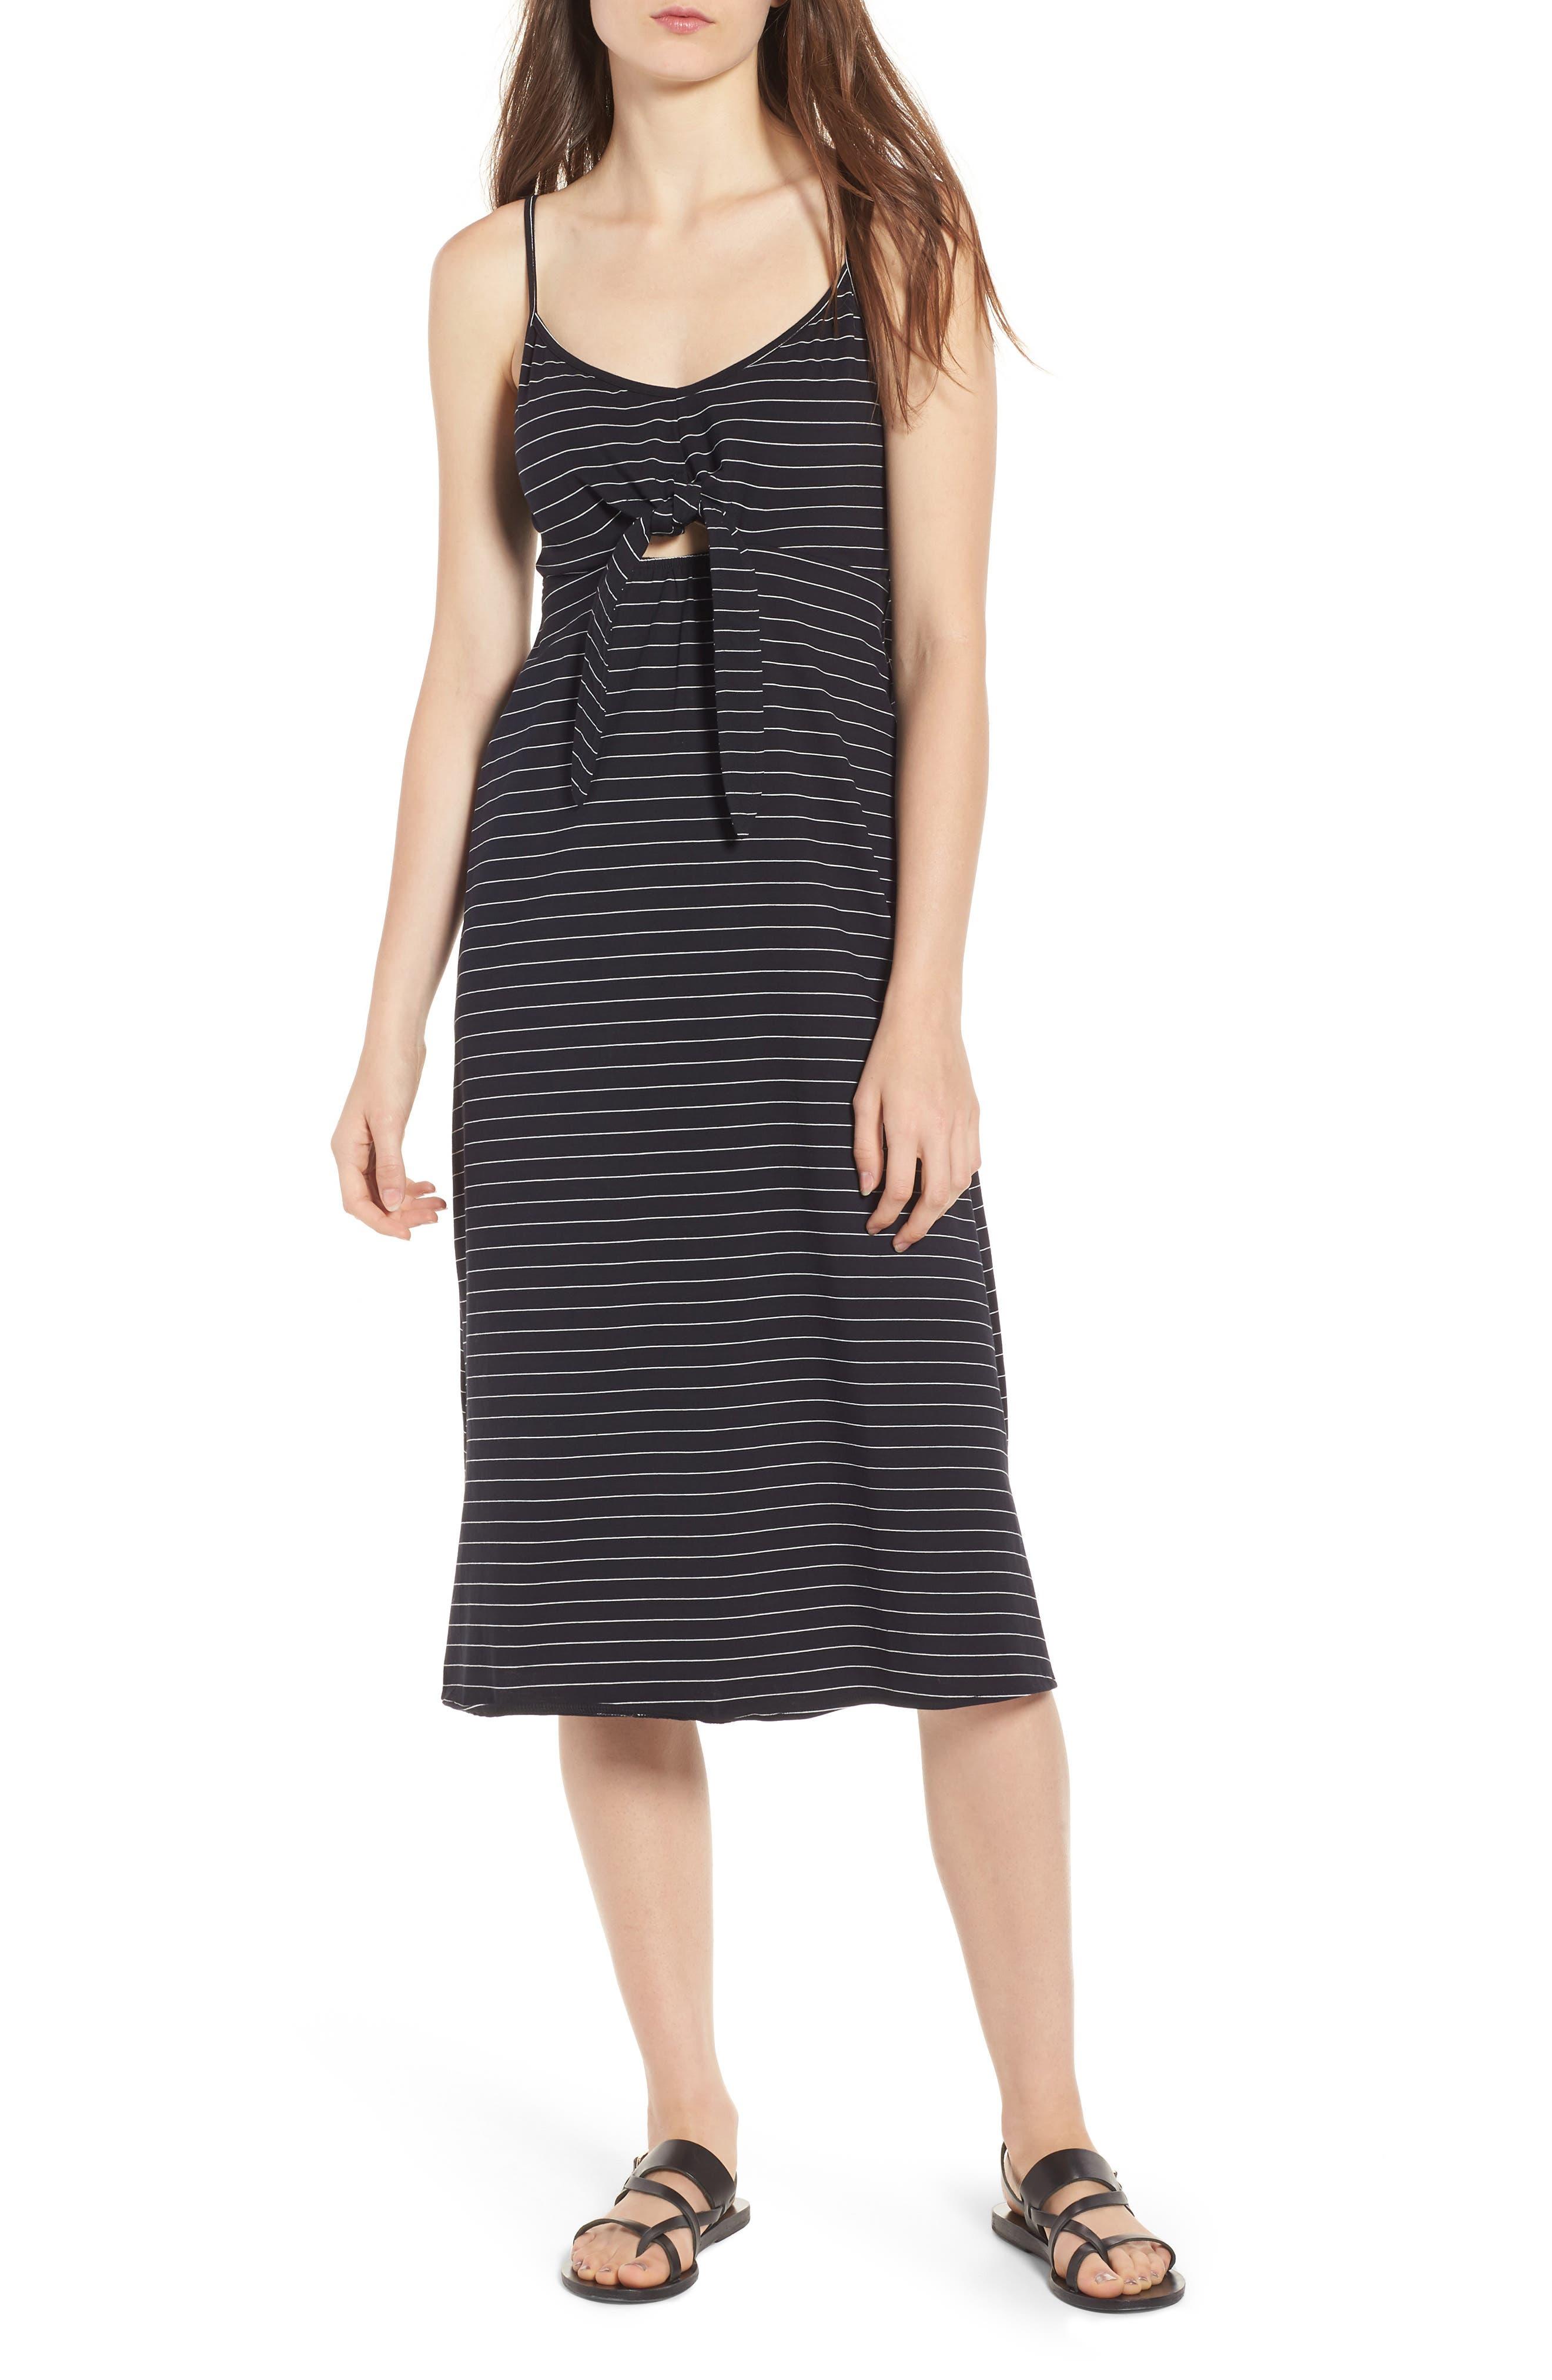 Suzanne Knot Front Dress,                             Main thumbnail 1, color,                             Black